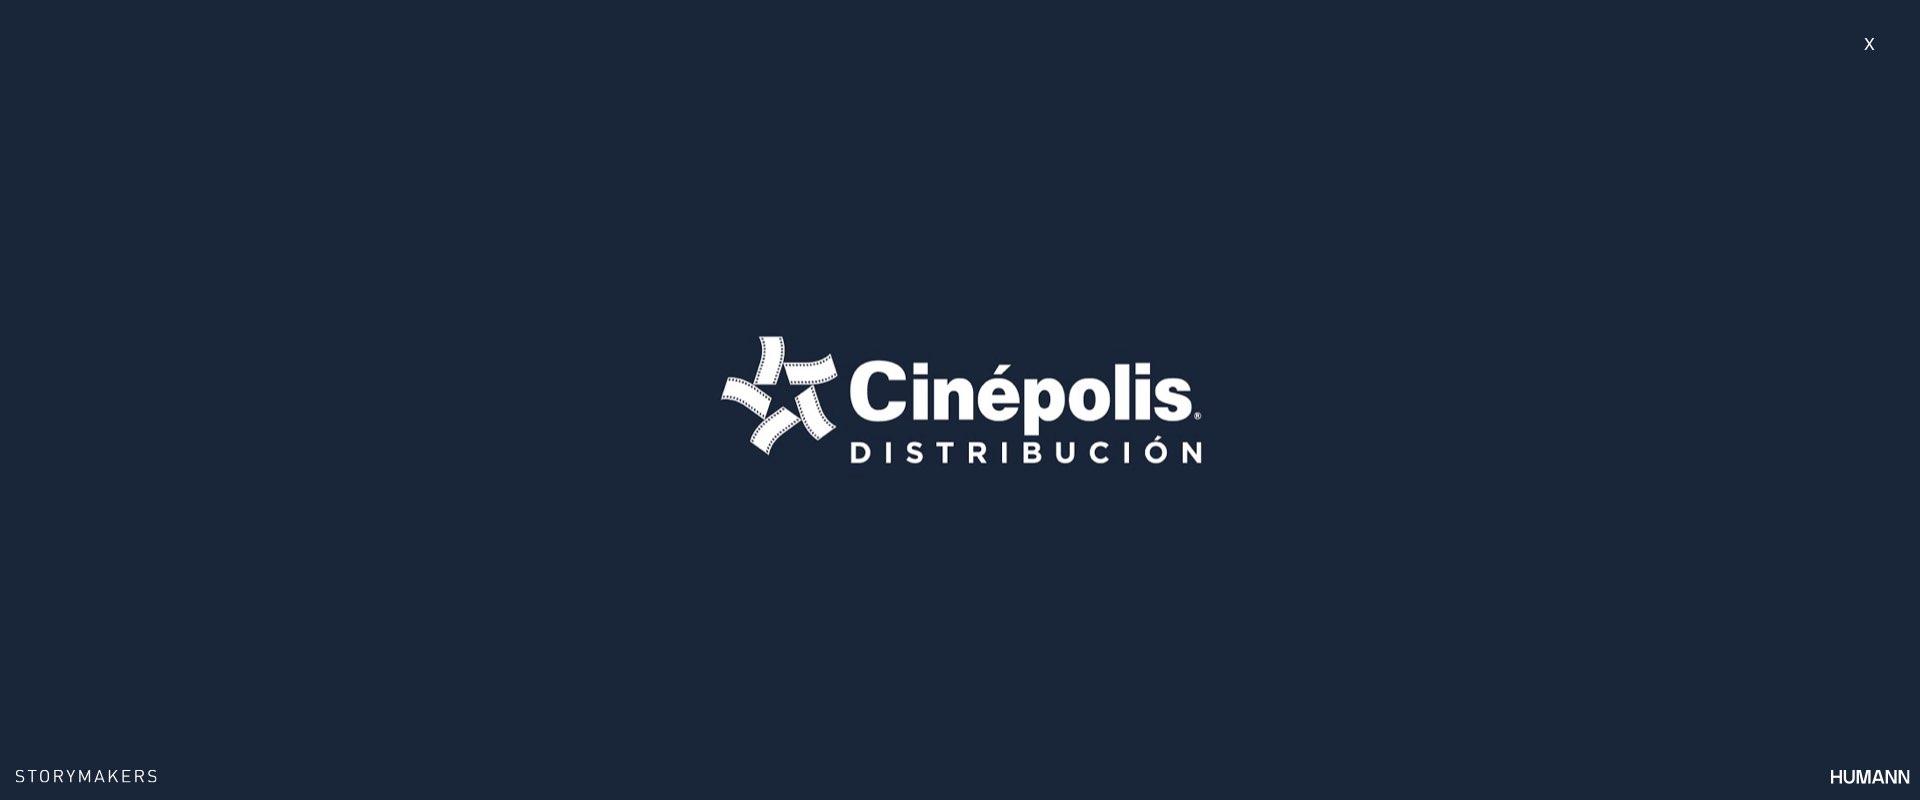 Humann :: Cinepolis Distribución :: Las Niñas Bien.002.jpeg